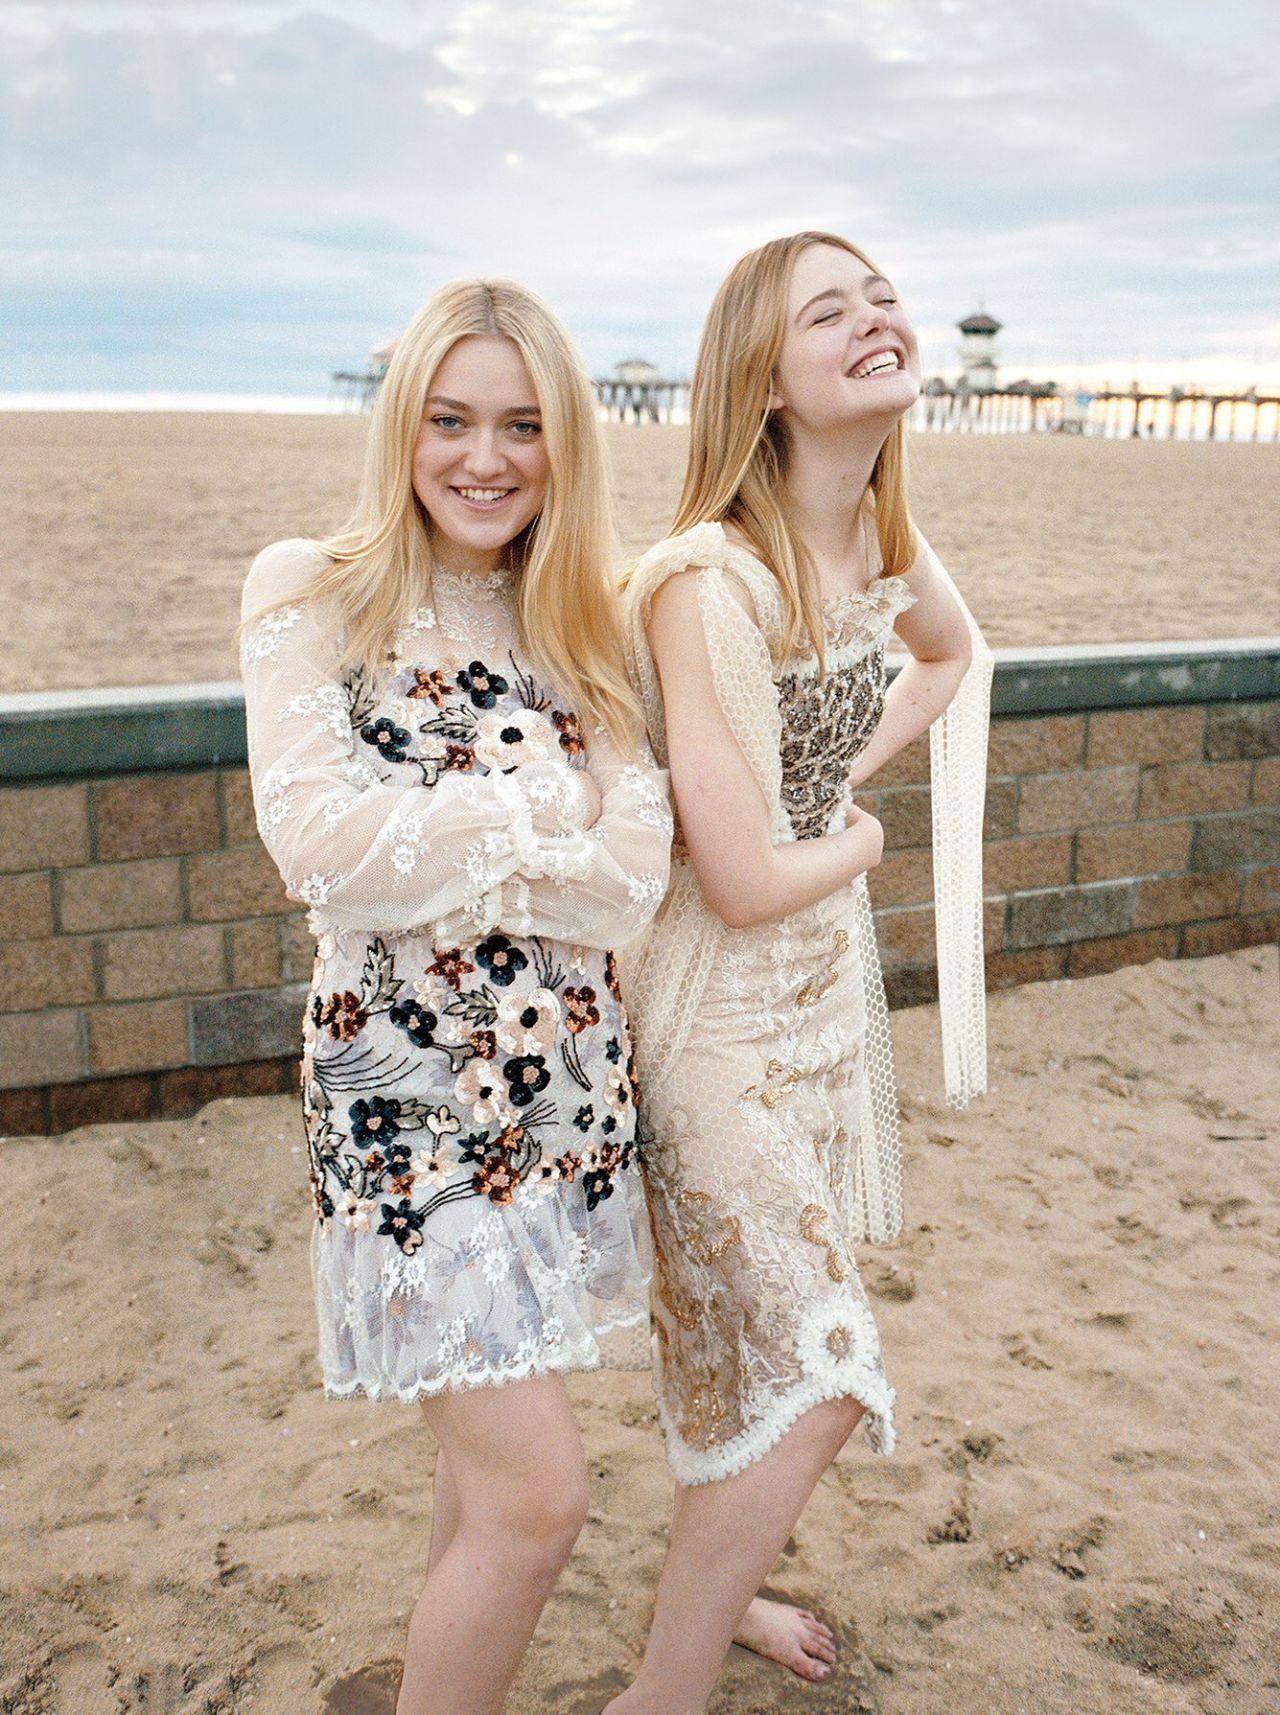 Elle Fanning & Dakota Fanning – Photoshoot for Vogue March 2017 Dakota Fanning